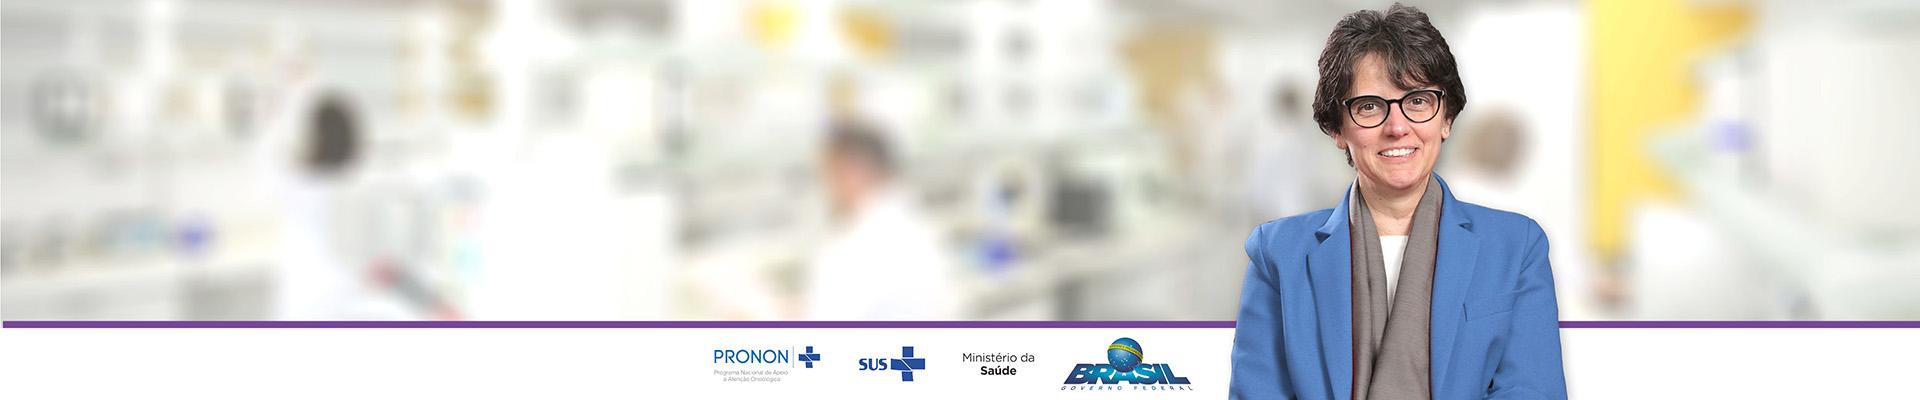 Pesquisa%20clinica banner